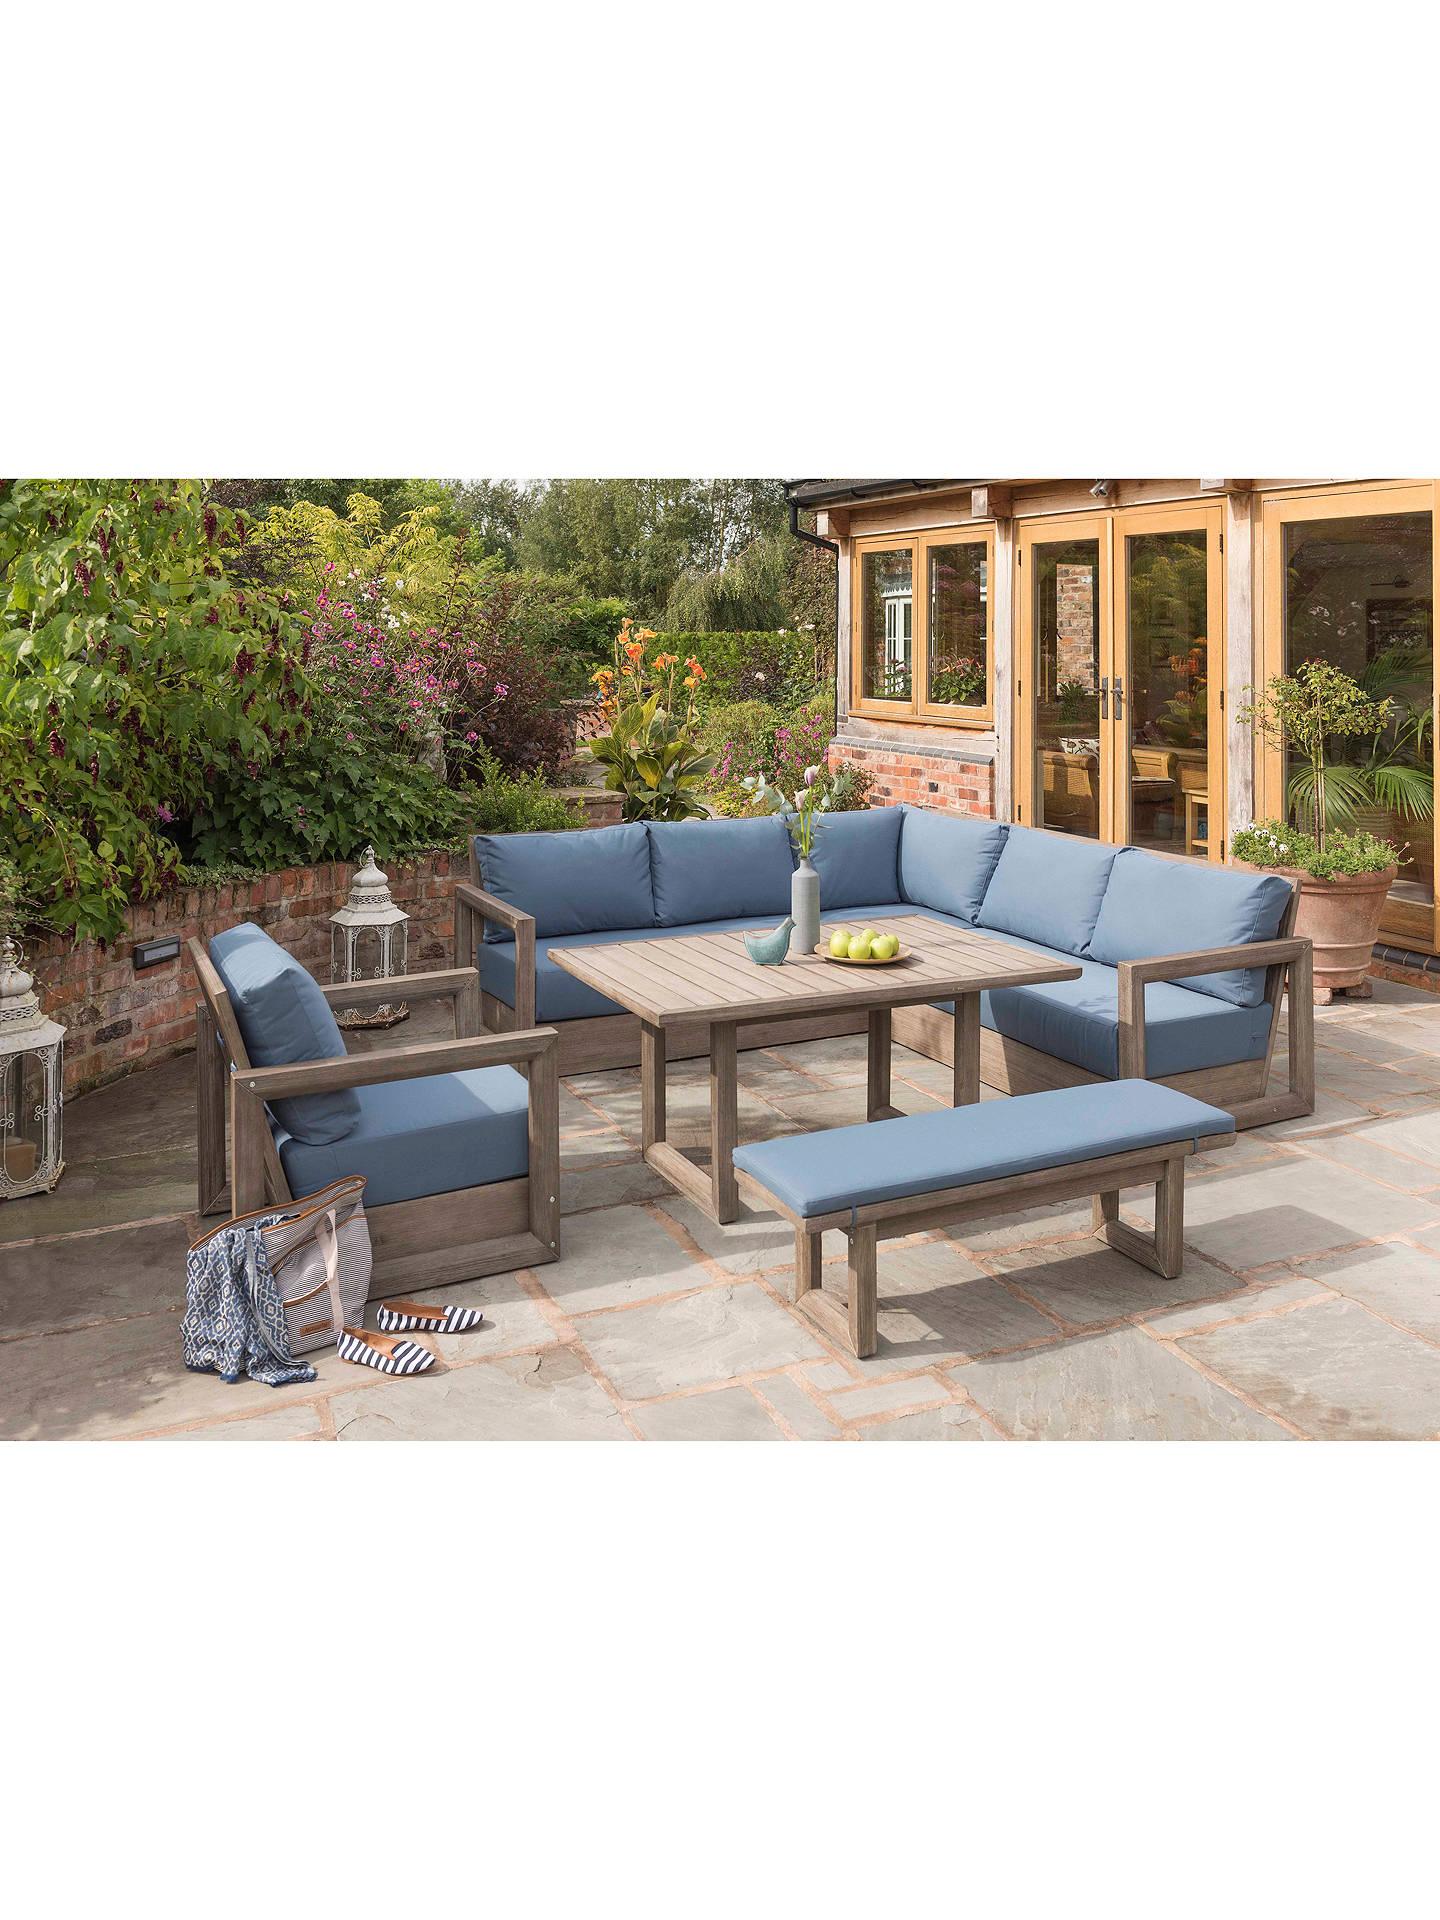 Kettler Ezra 6 Seat Garden Table And Chairs Corner